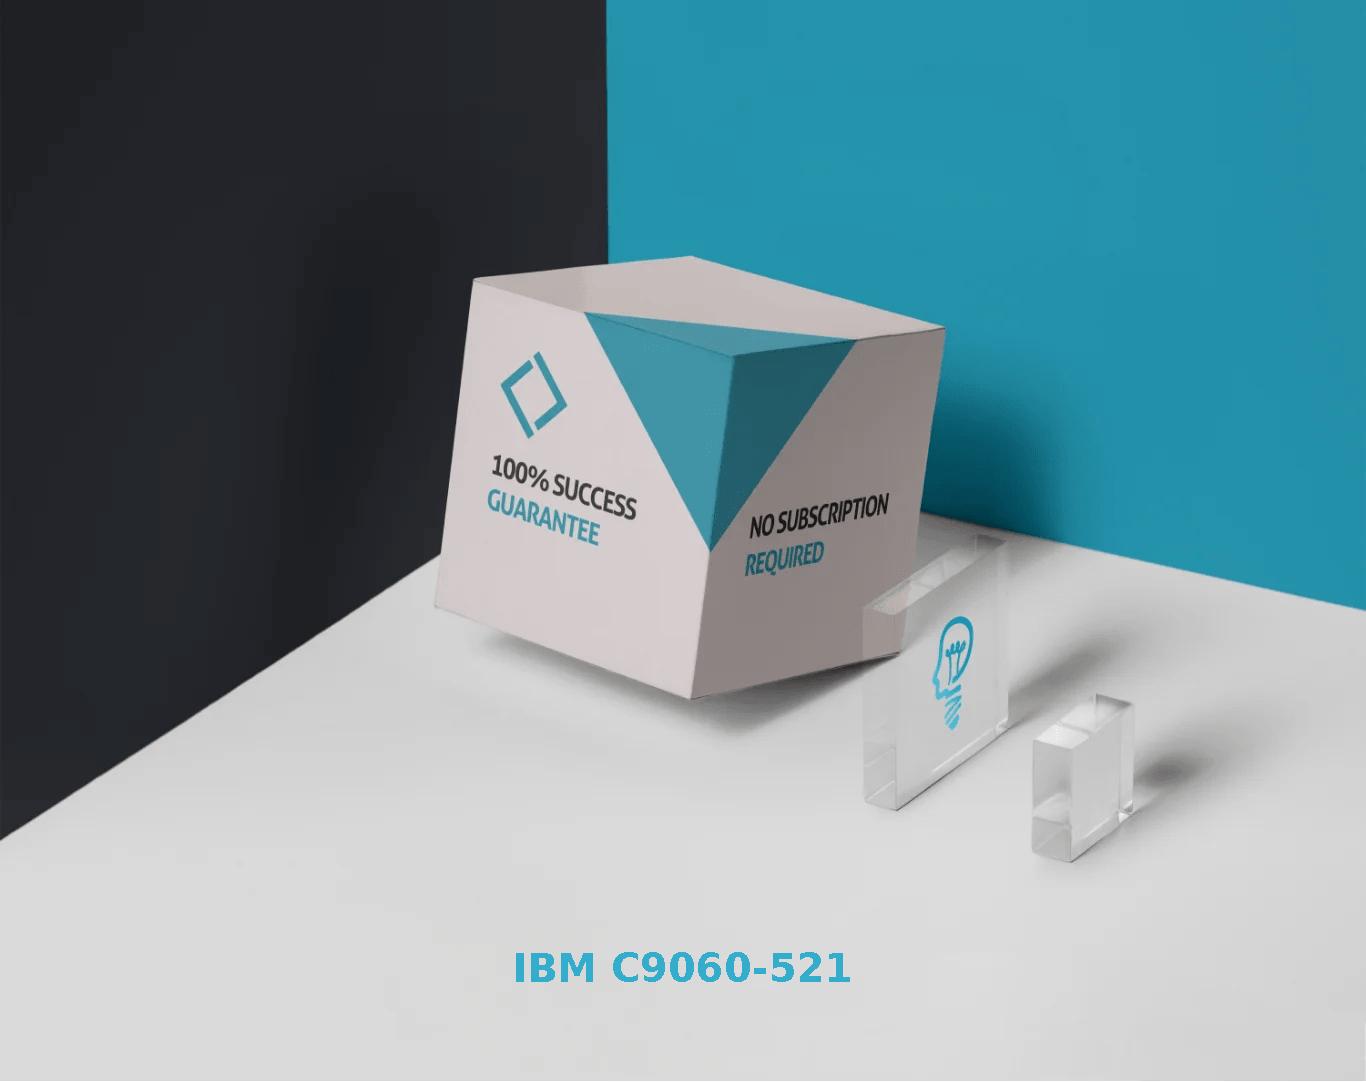 IBM C9060-521 Exams